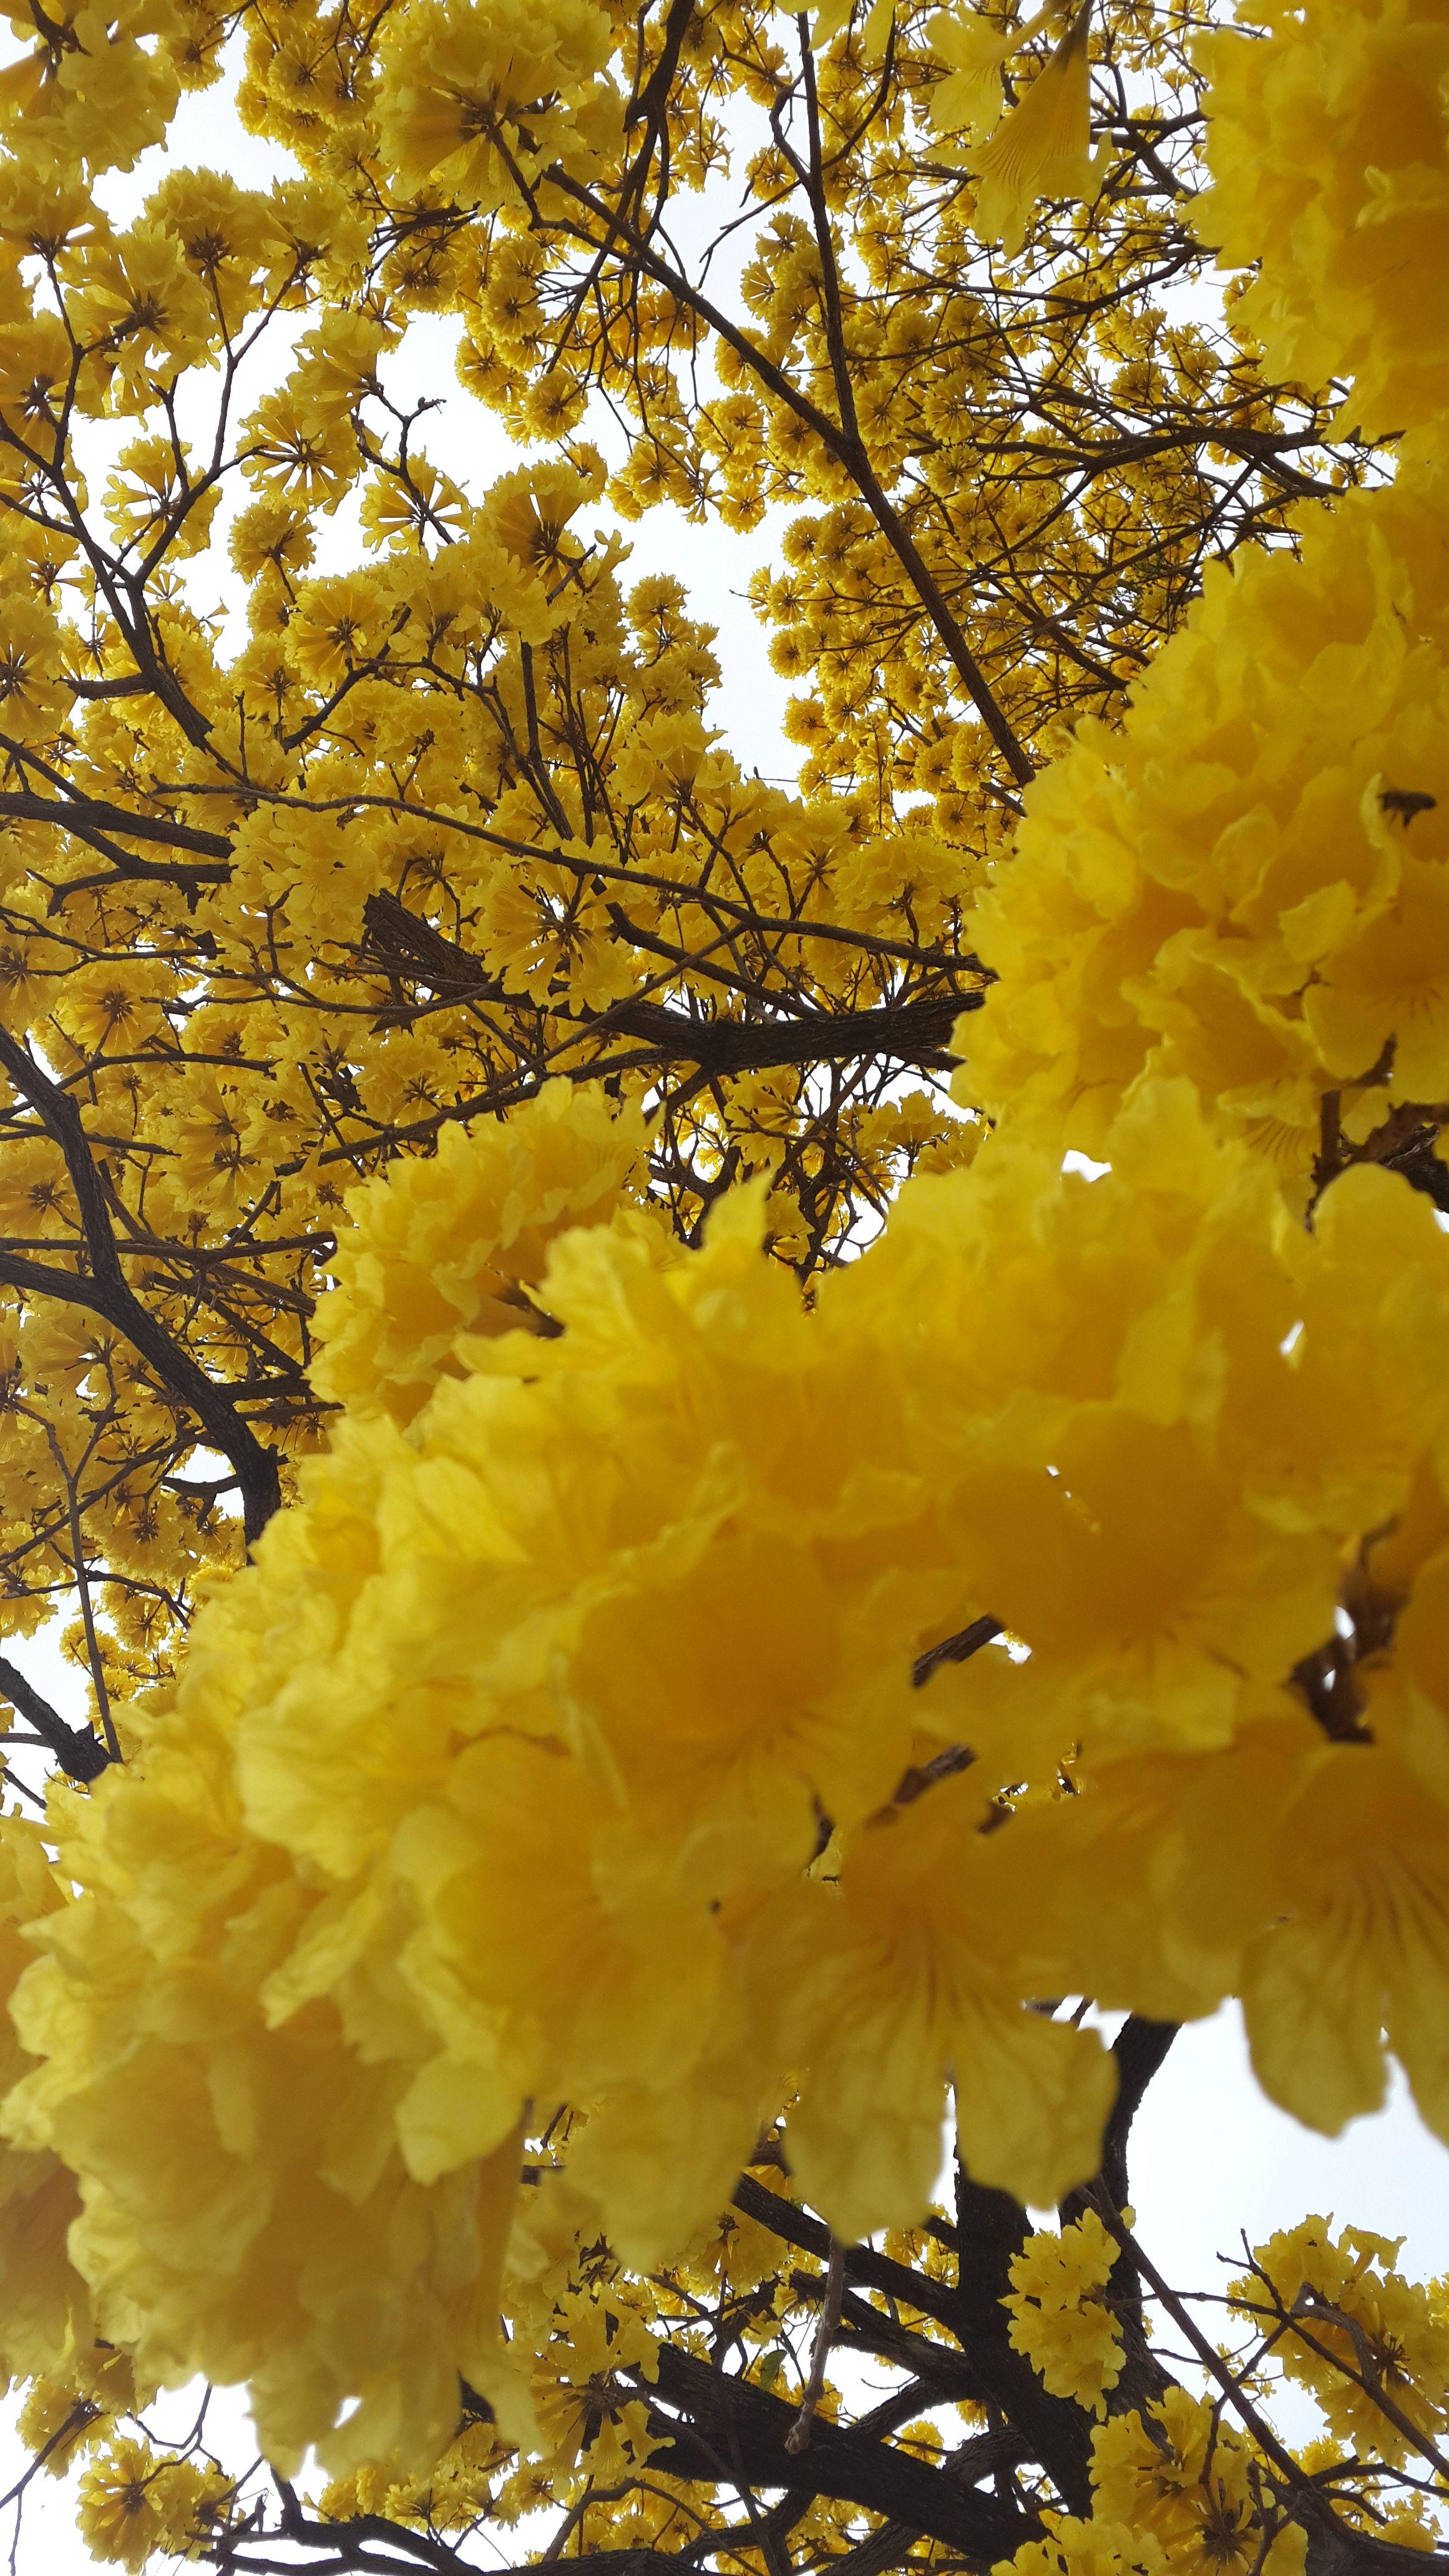 tabebuia chrysotricha ip amarelo by carolina senra pflanzen blumen und str ucher. Black Bedroom Furniture Sets. Home Design Ideas